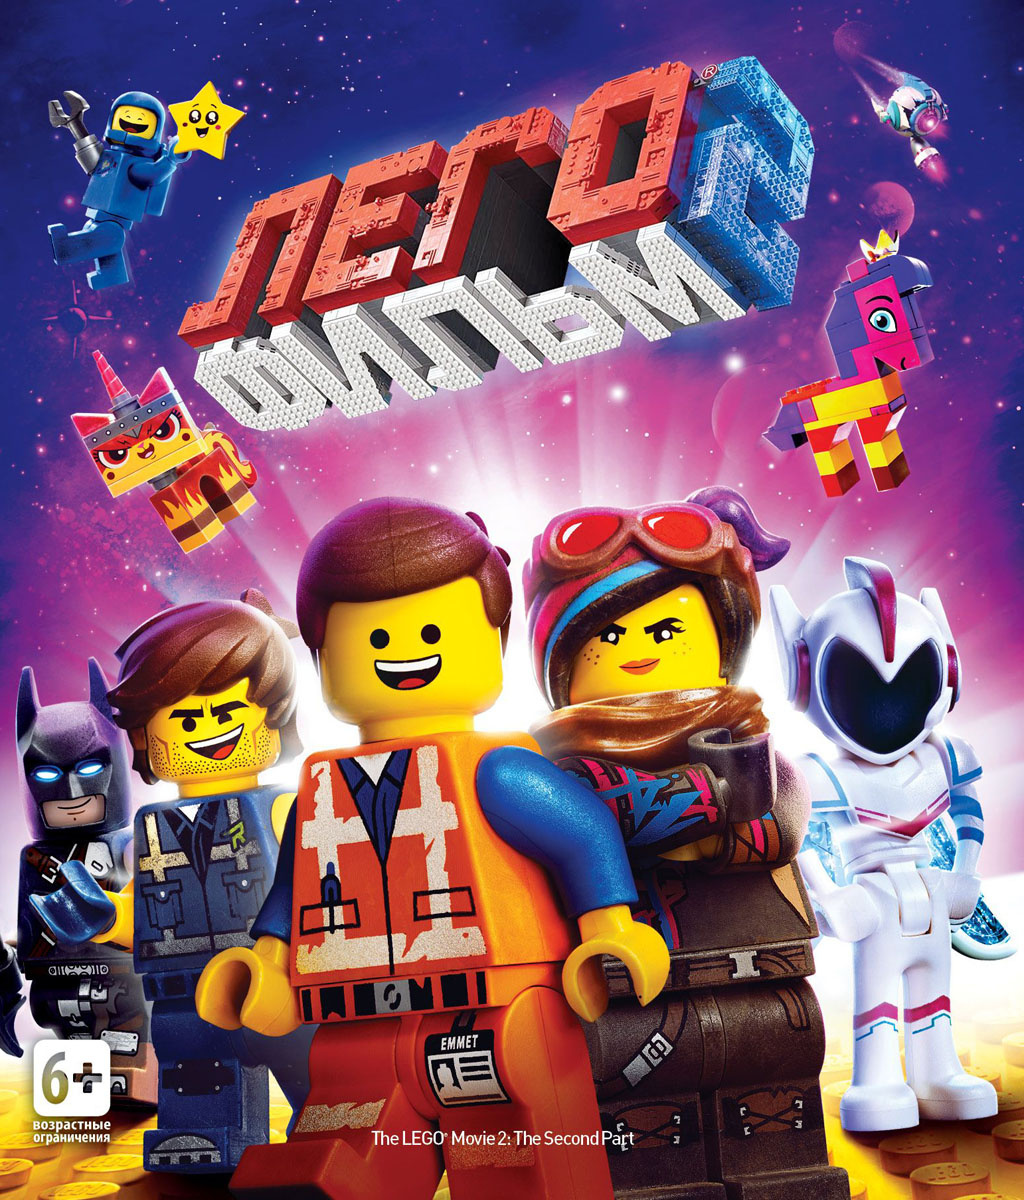 Лего Фильм 2 - Blu-Ray + Бонус: доп. материалы / Warner Bros. #1